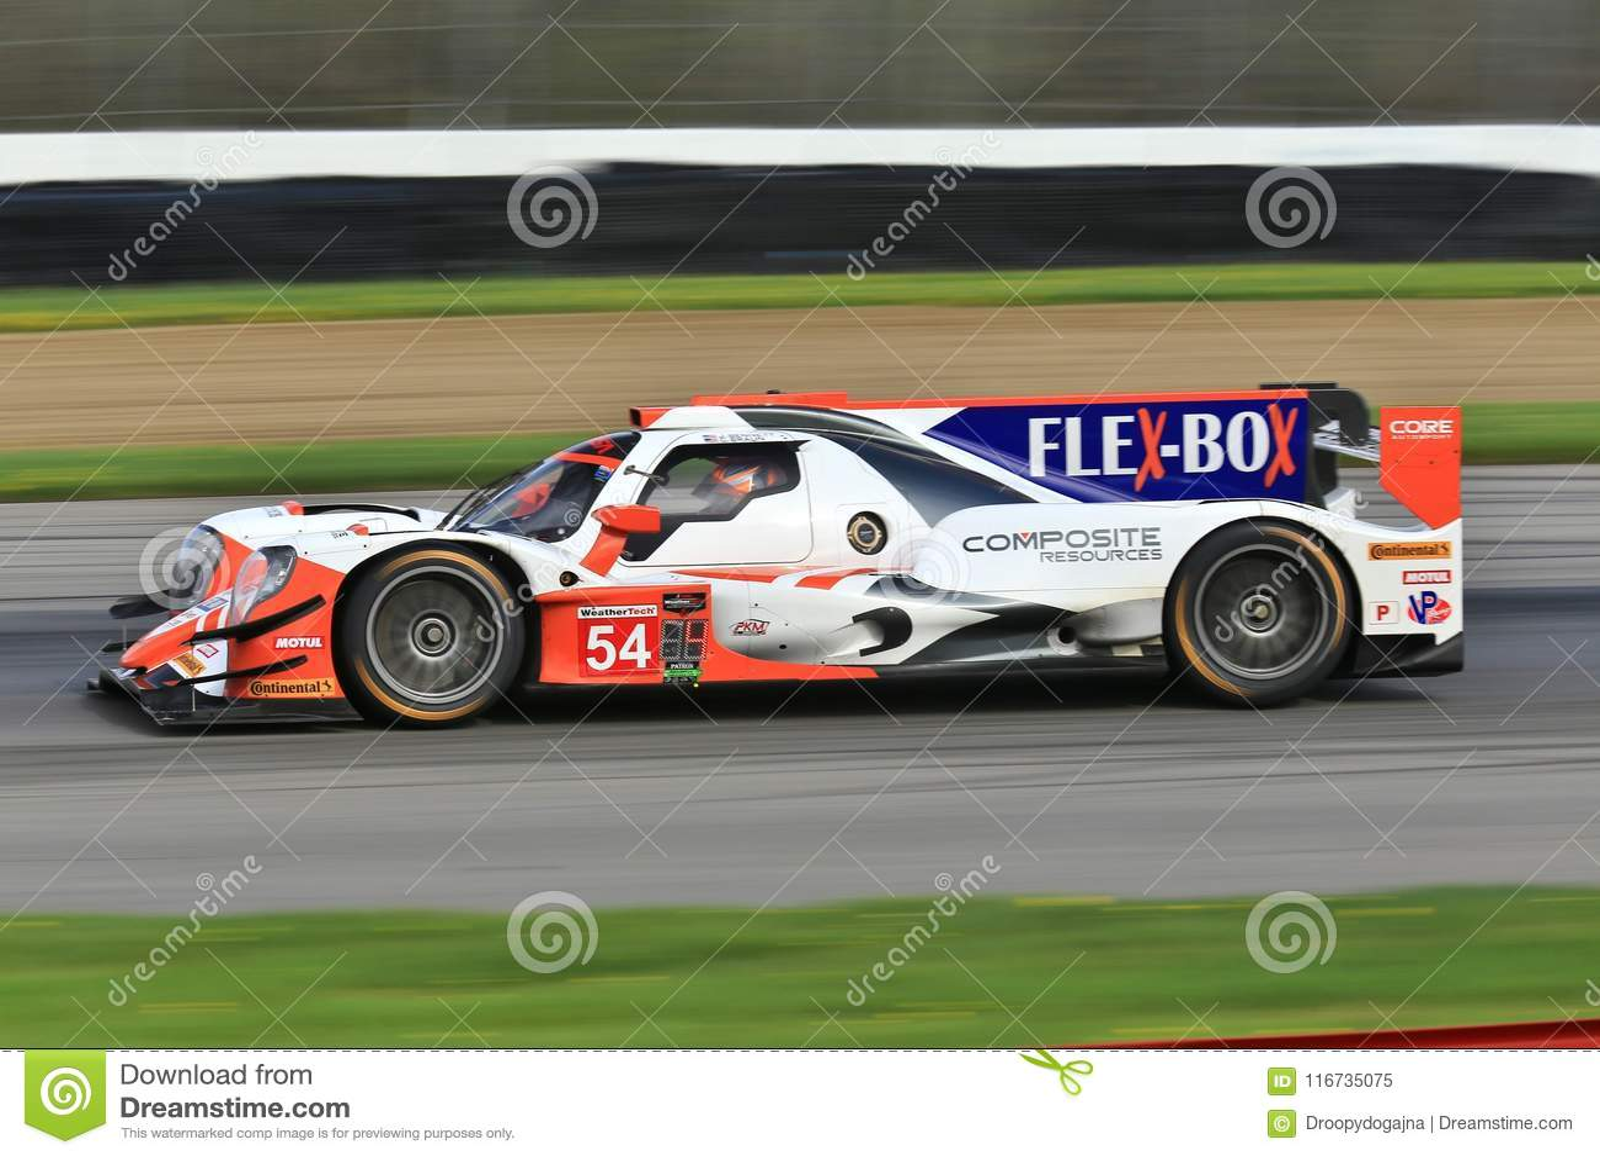 54 CORE Autosport ORECA LMP2 Racing, IMSA, WeatherTech SportsCar  Championship, Continental Tire Sports Car Challenge, Prototype, GT Le Mans  GTLM, ...